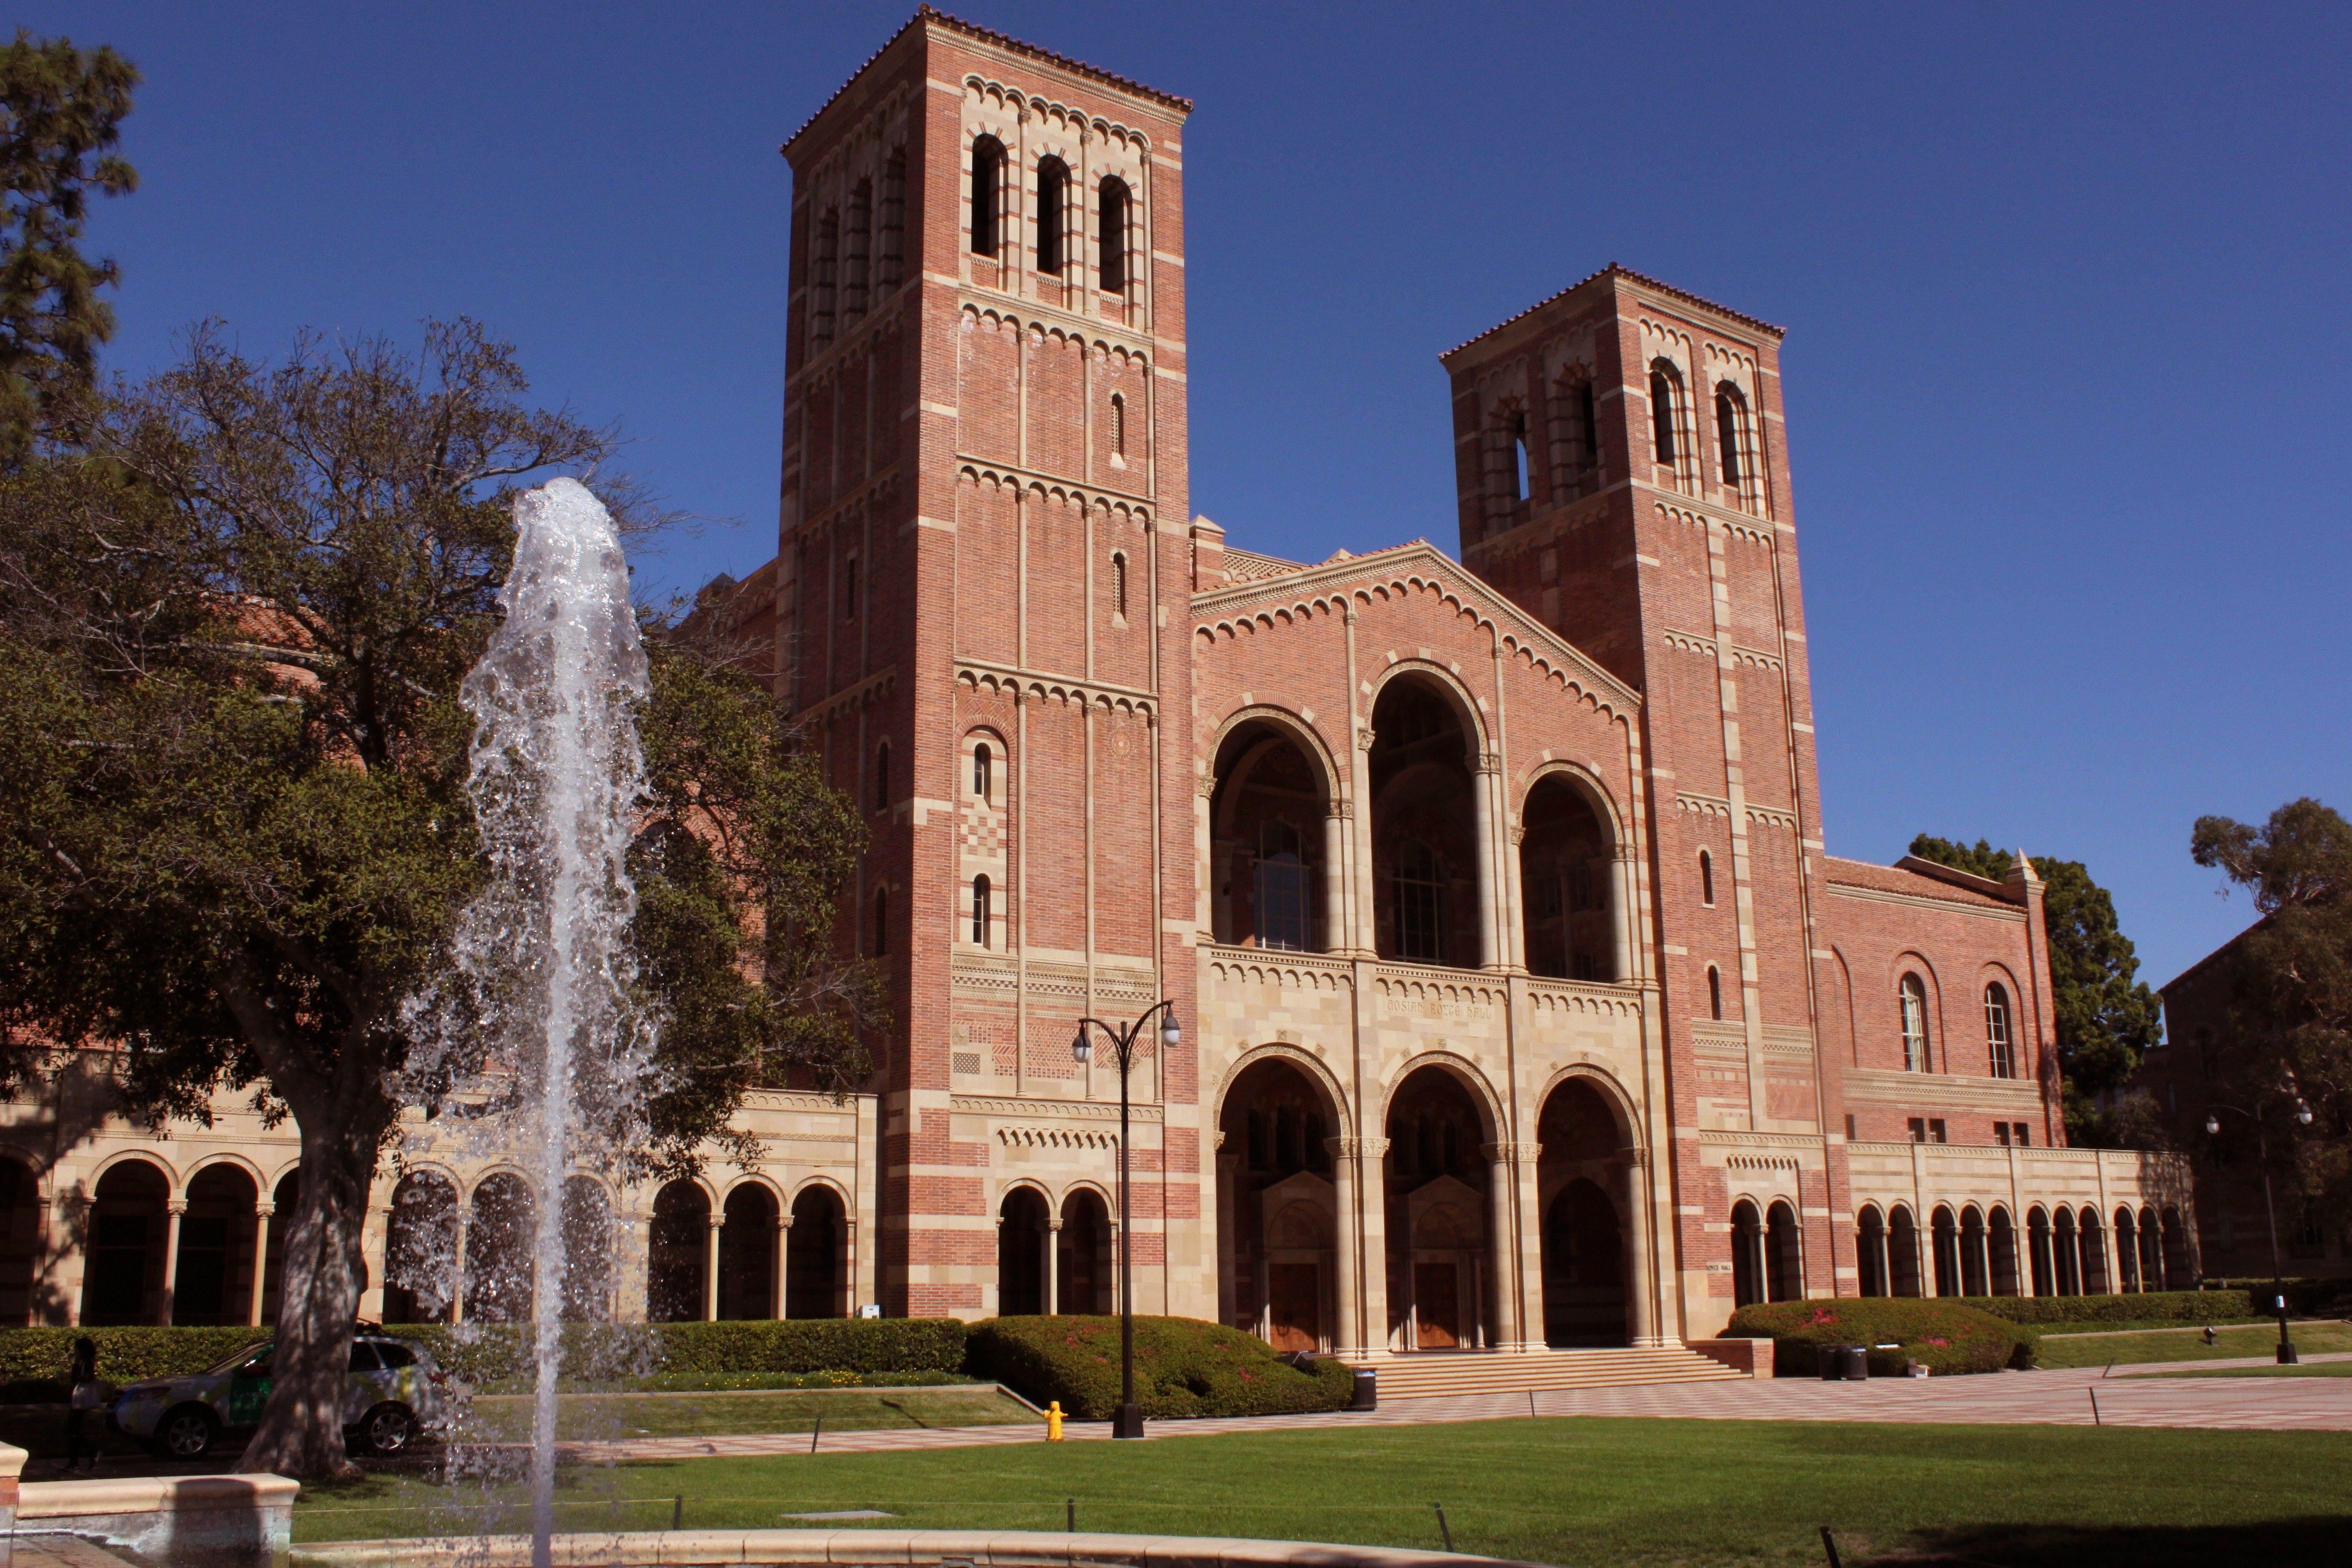 Ucla Royce Hall Ucla Campus University Of California Los Angeles University Of California